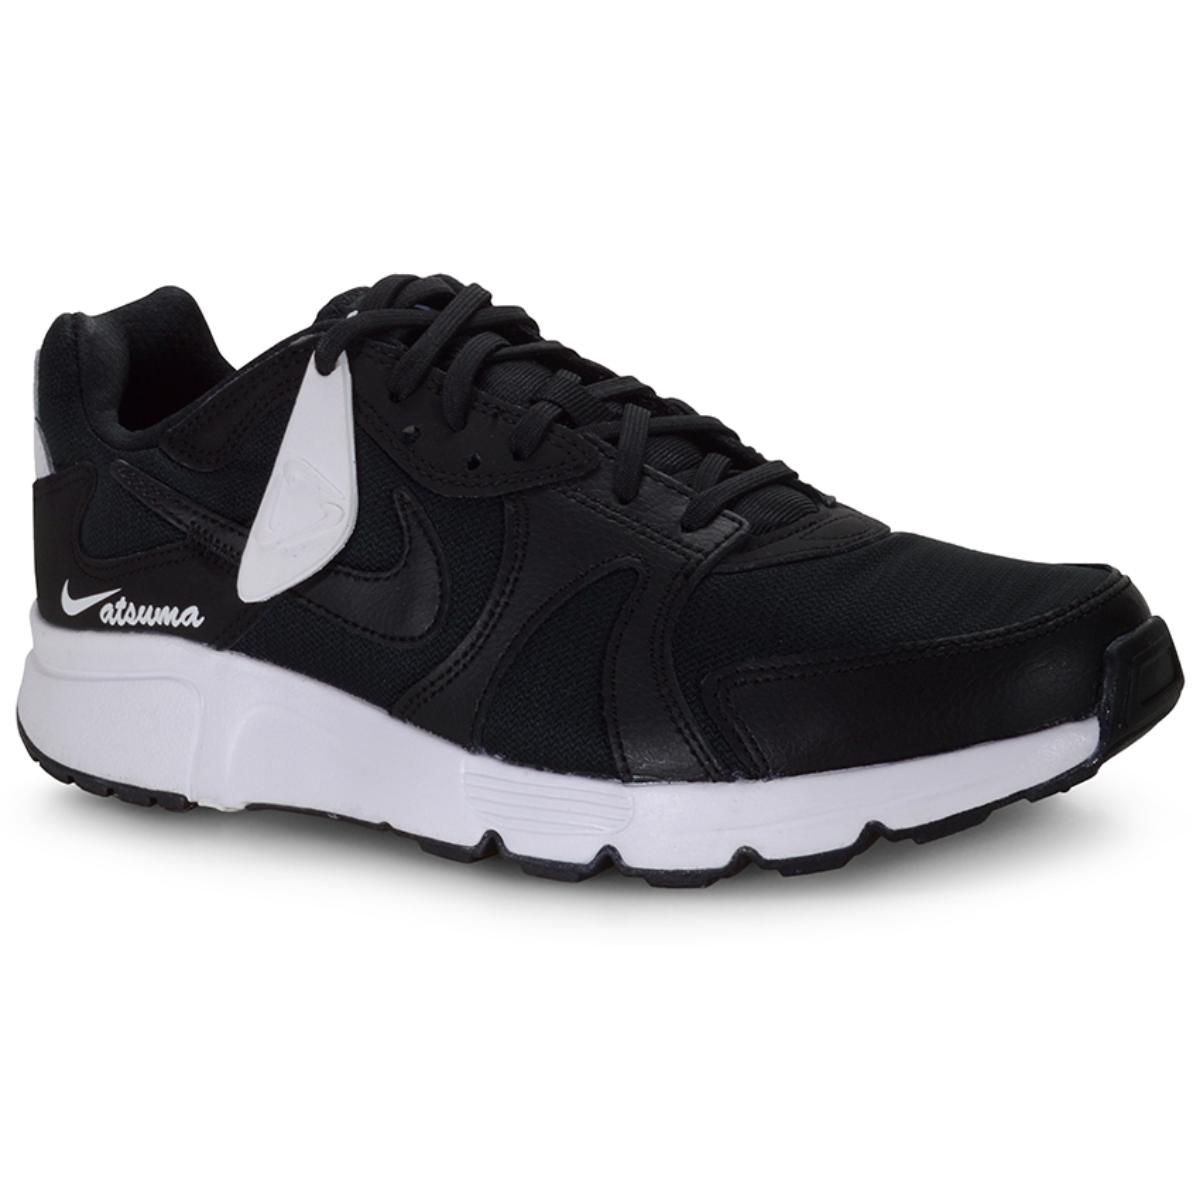 Tênis Masculino Nike Cd5461-004 Atsuma Preto/branco